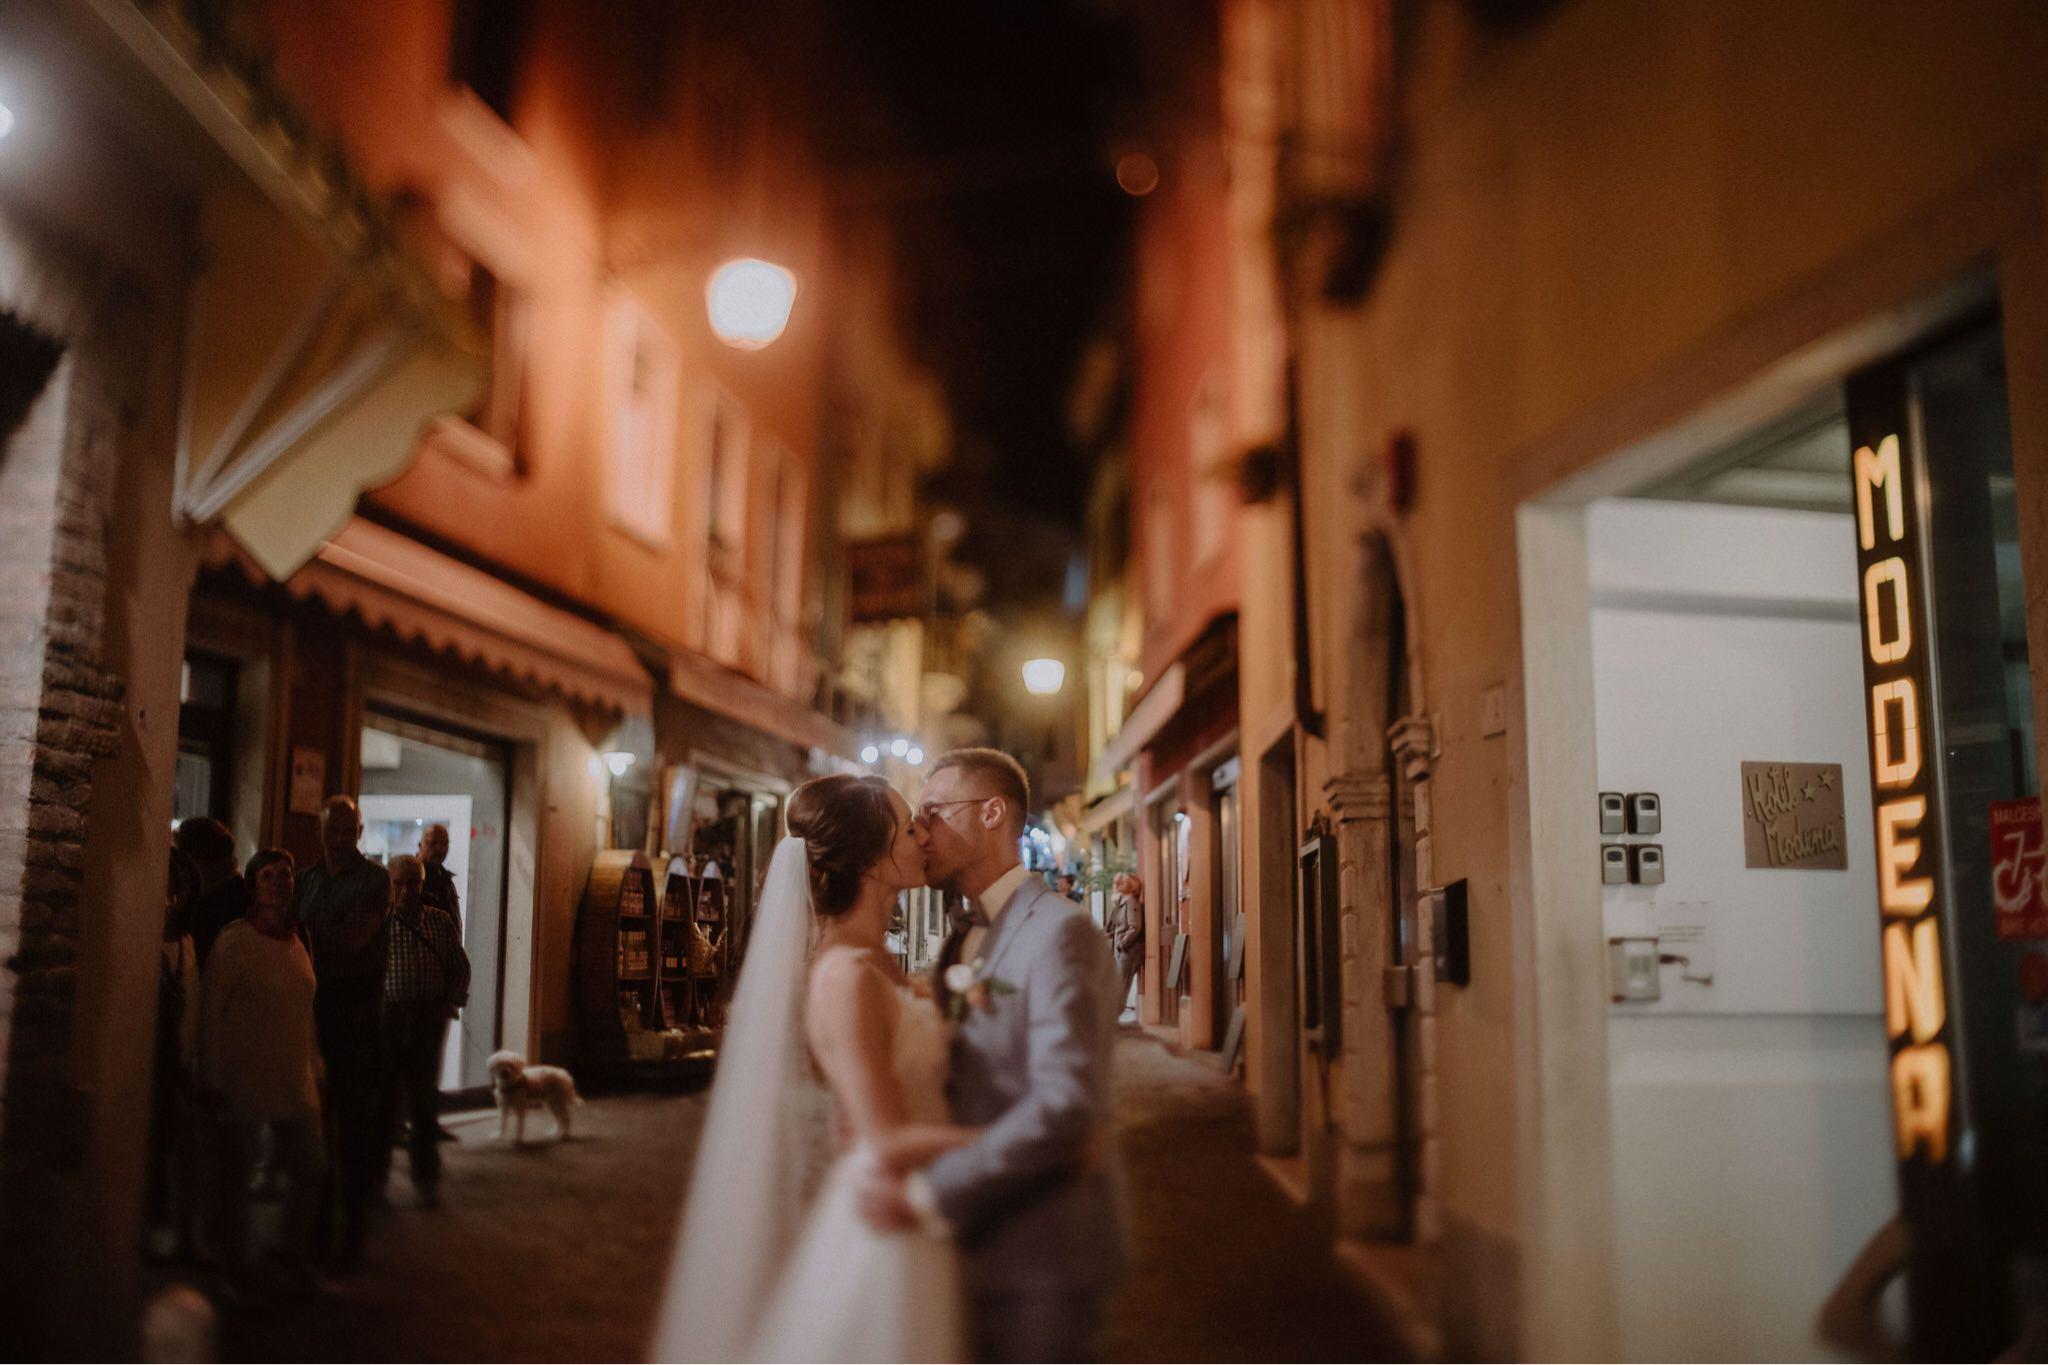 67 la 04 abend 1215 weddinphotographer Hochzeitsfotograf newzealand hamilton Weddingphotography Stuttgart